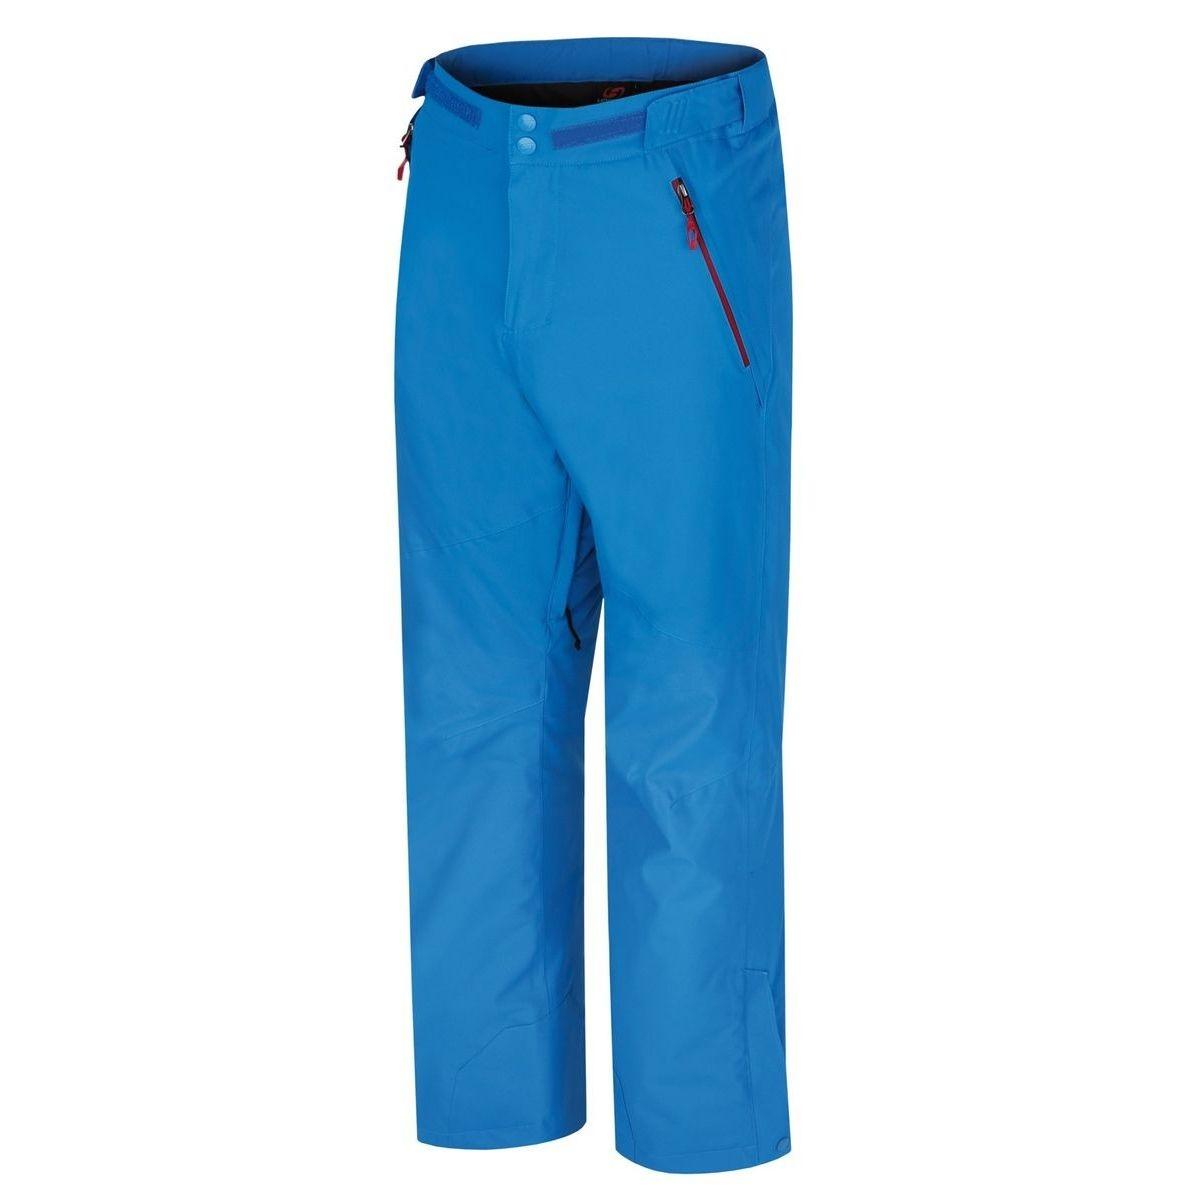 Pantaloni schi barbati Hannah Park Albastru imagine